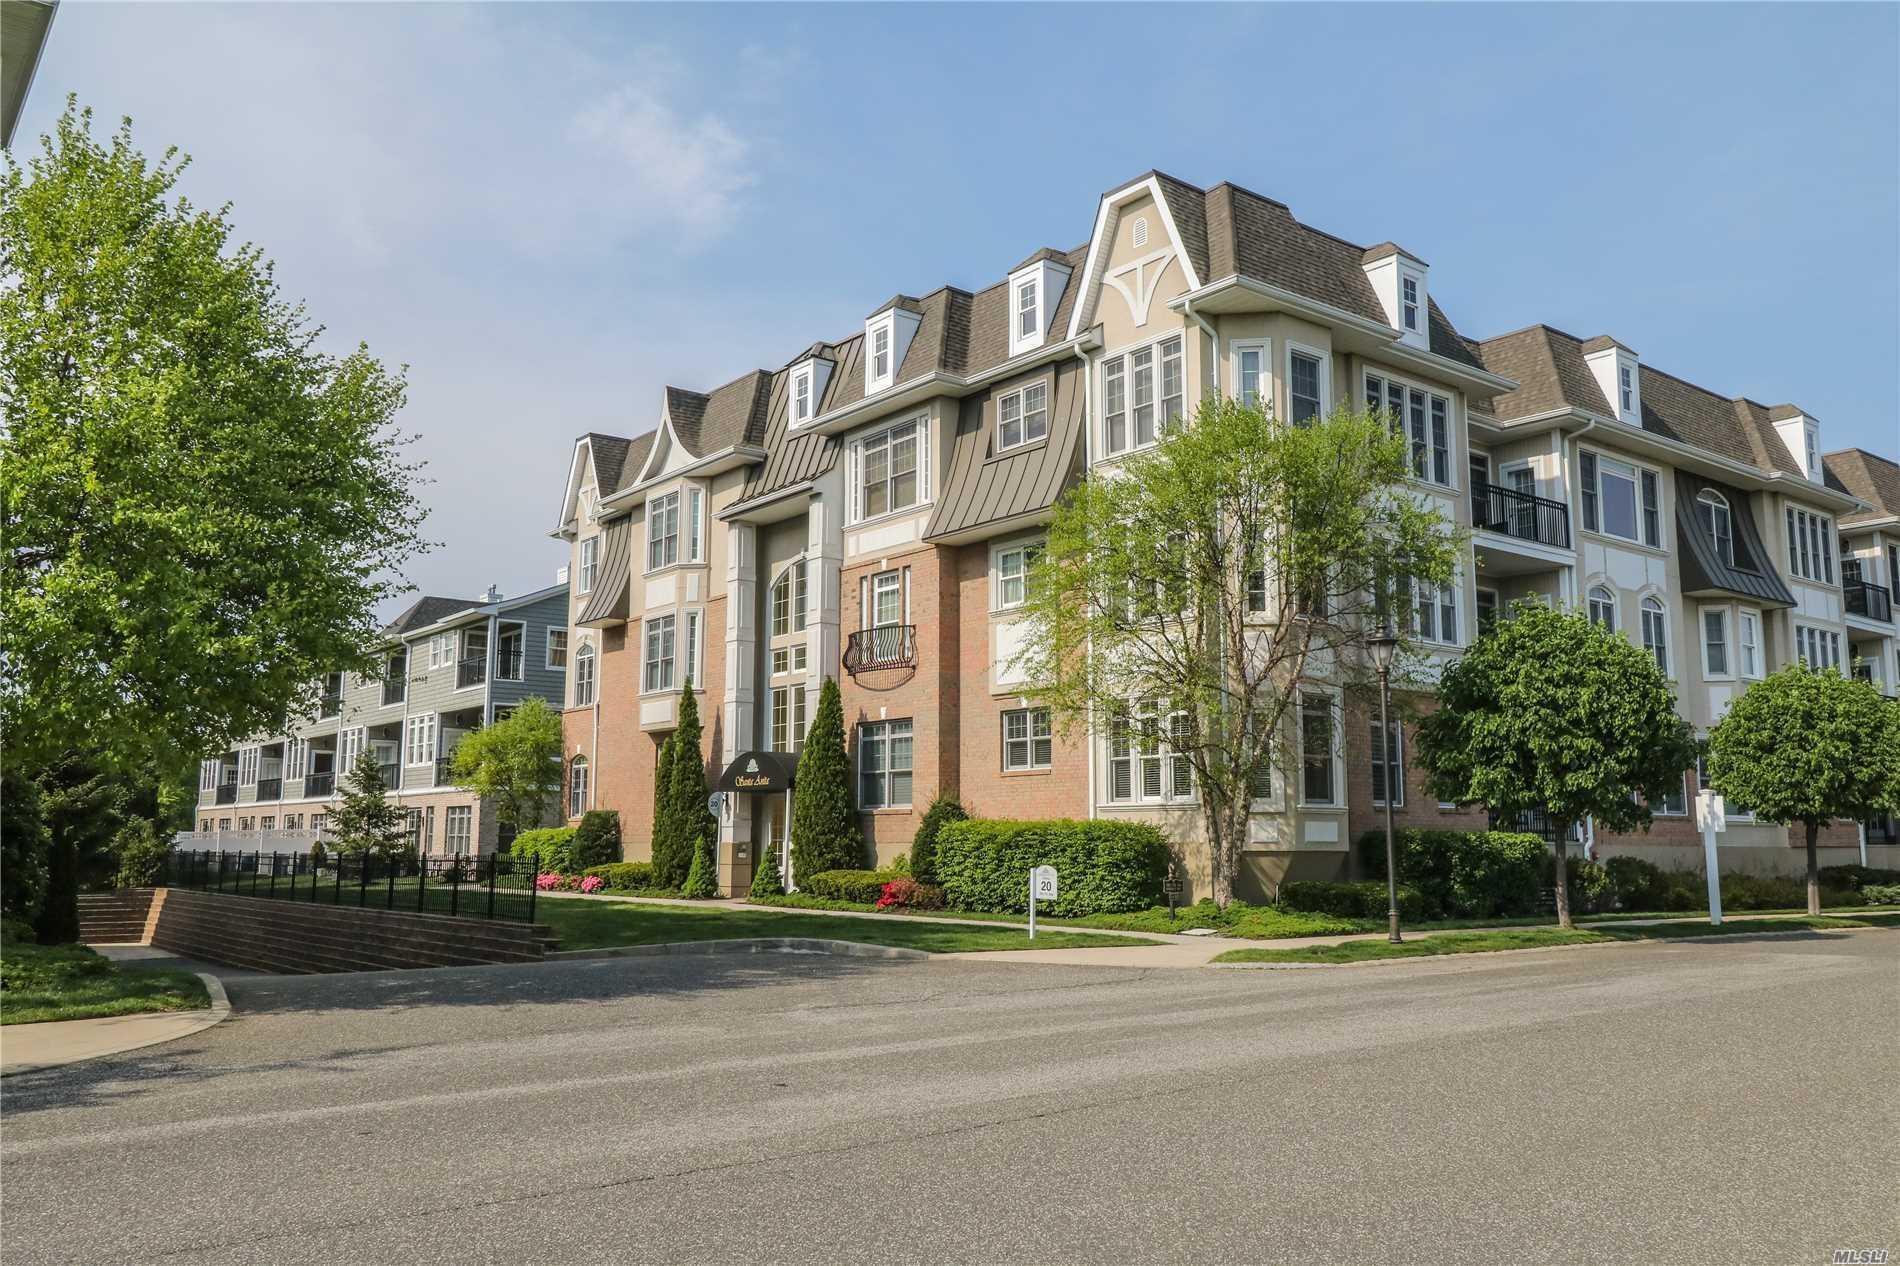 Property for sale at 701 Roosevelt Way, Westbury,  NY 11590